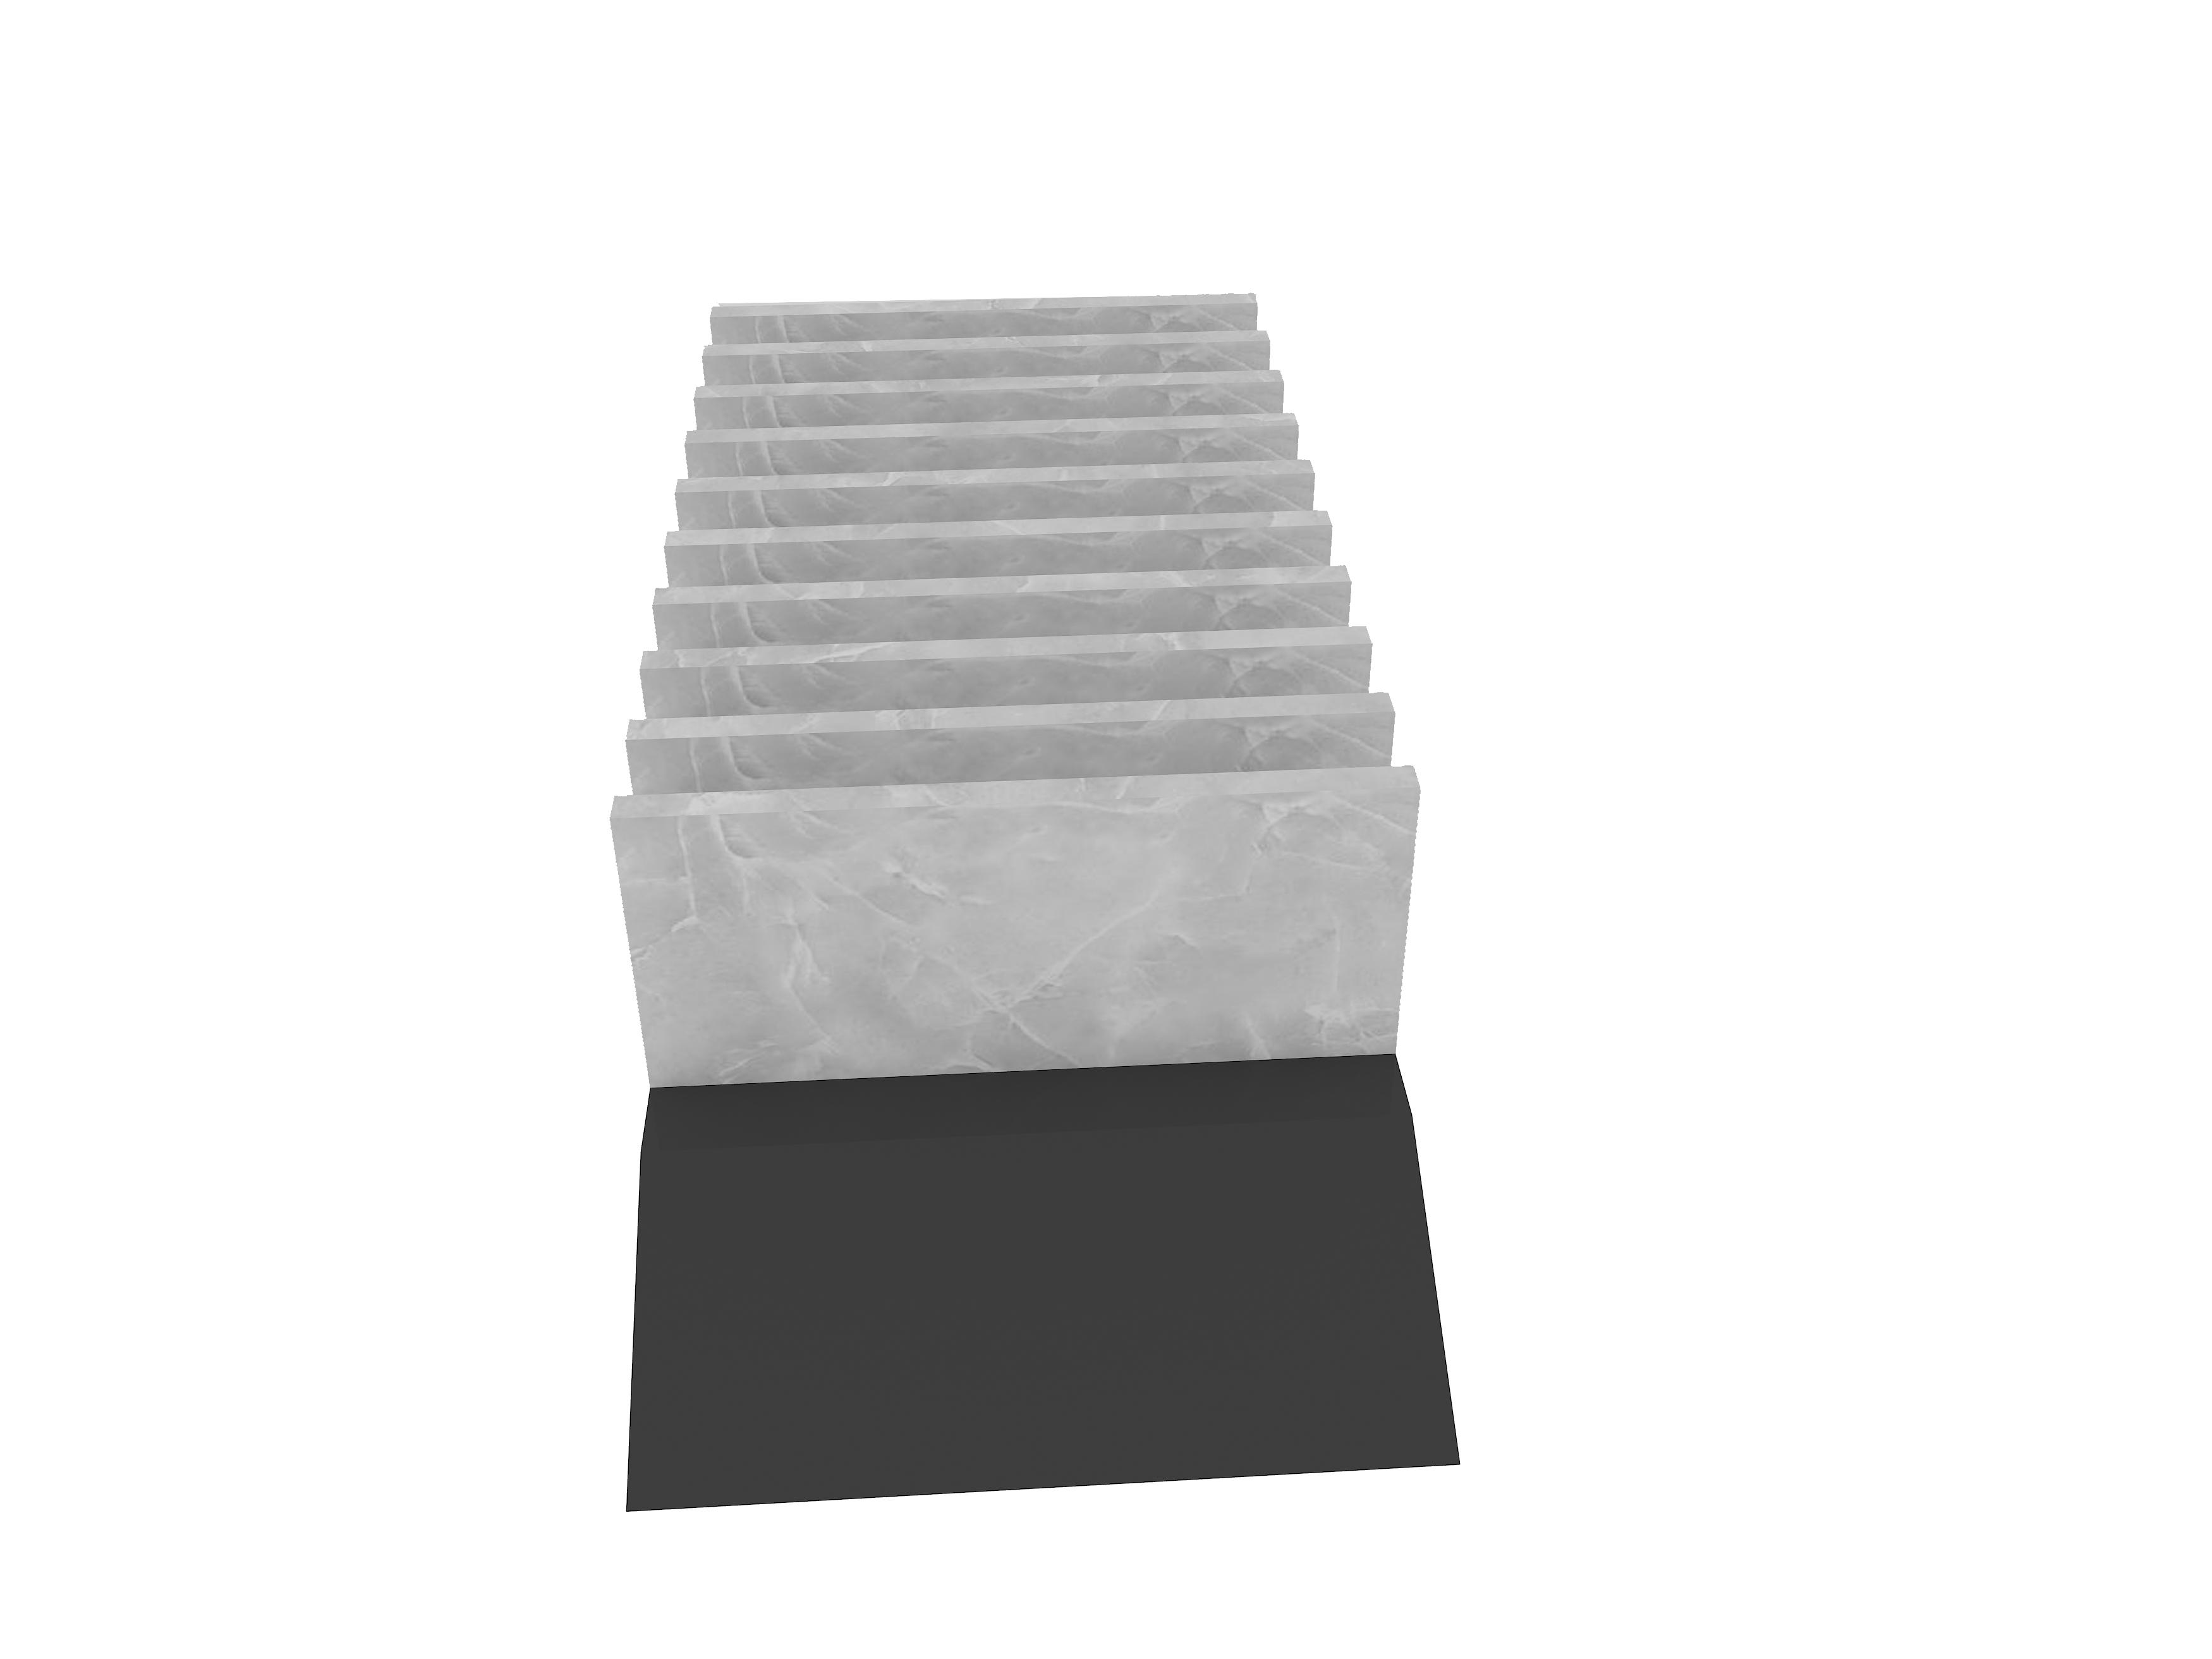 modern-tile-countertop-stand-ceramic-tile-holders-ST-33-3